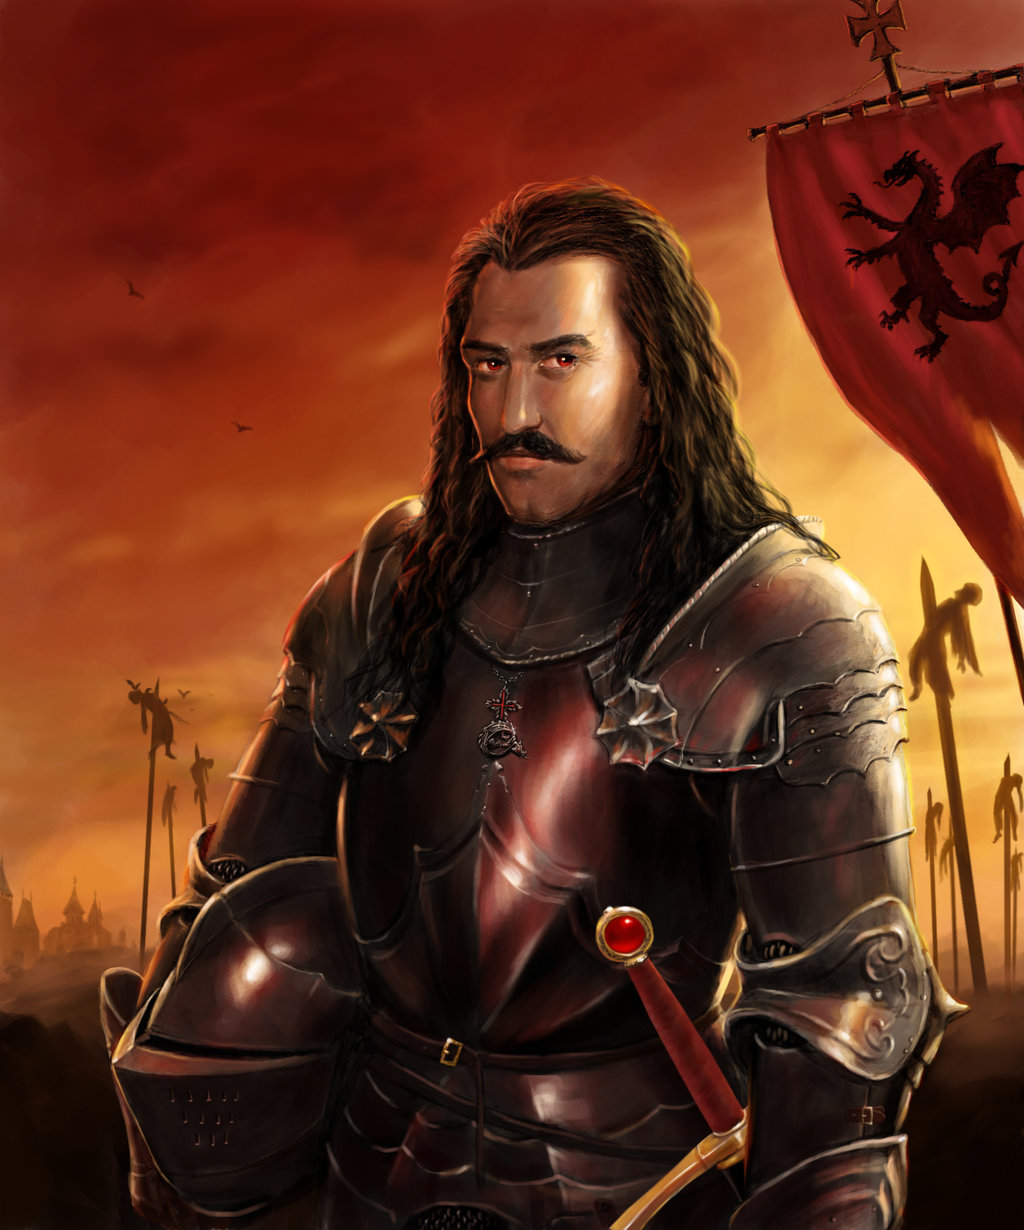 Vlad the Impaler: Monster or Hero? by dashinvaine on DeviantArt